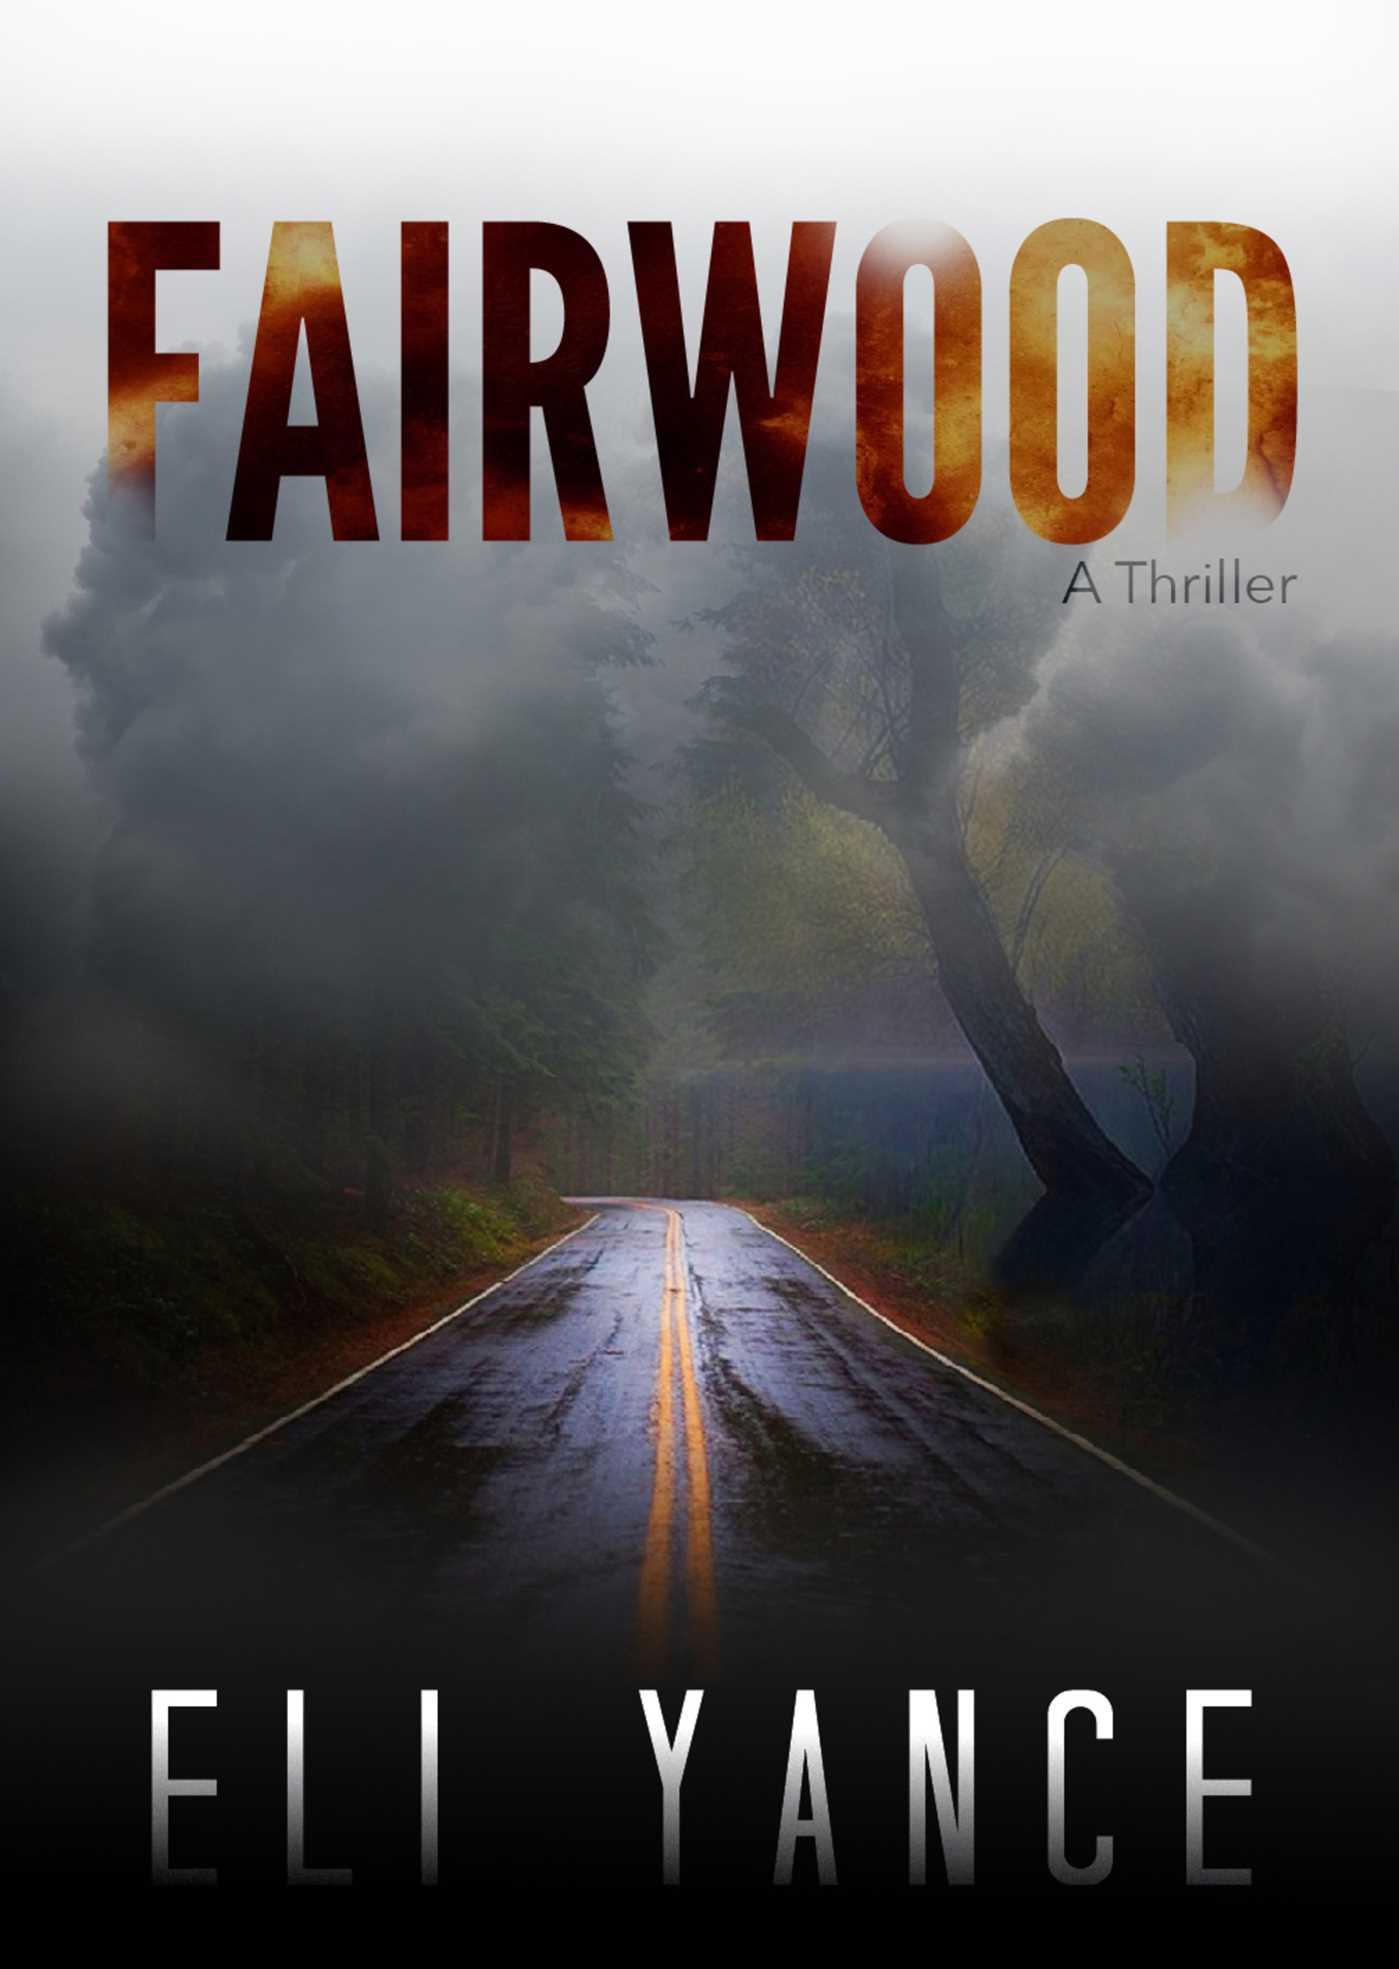 Fairwood 9781510704398 hr